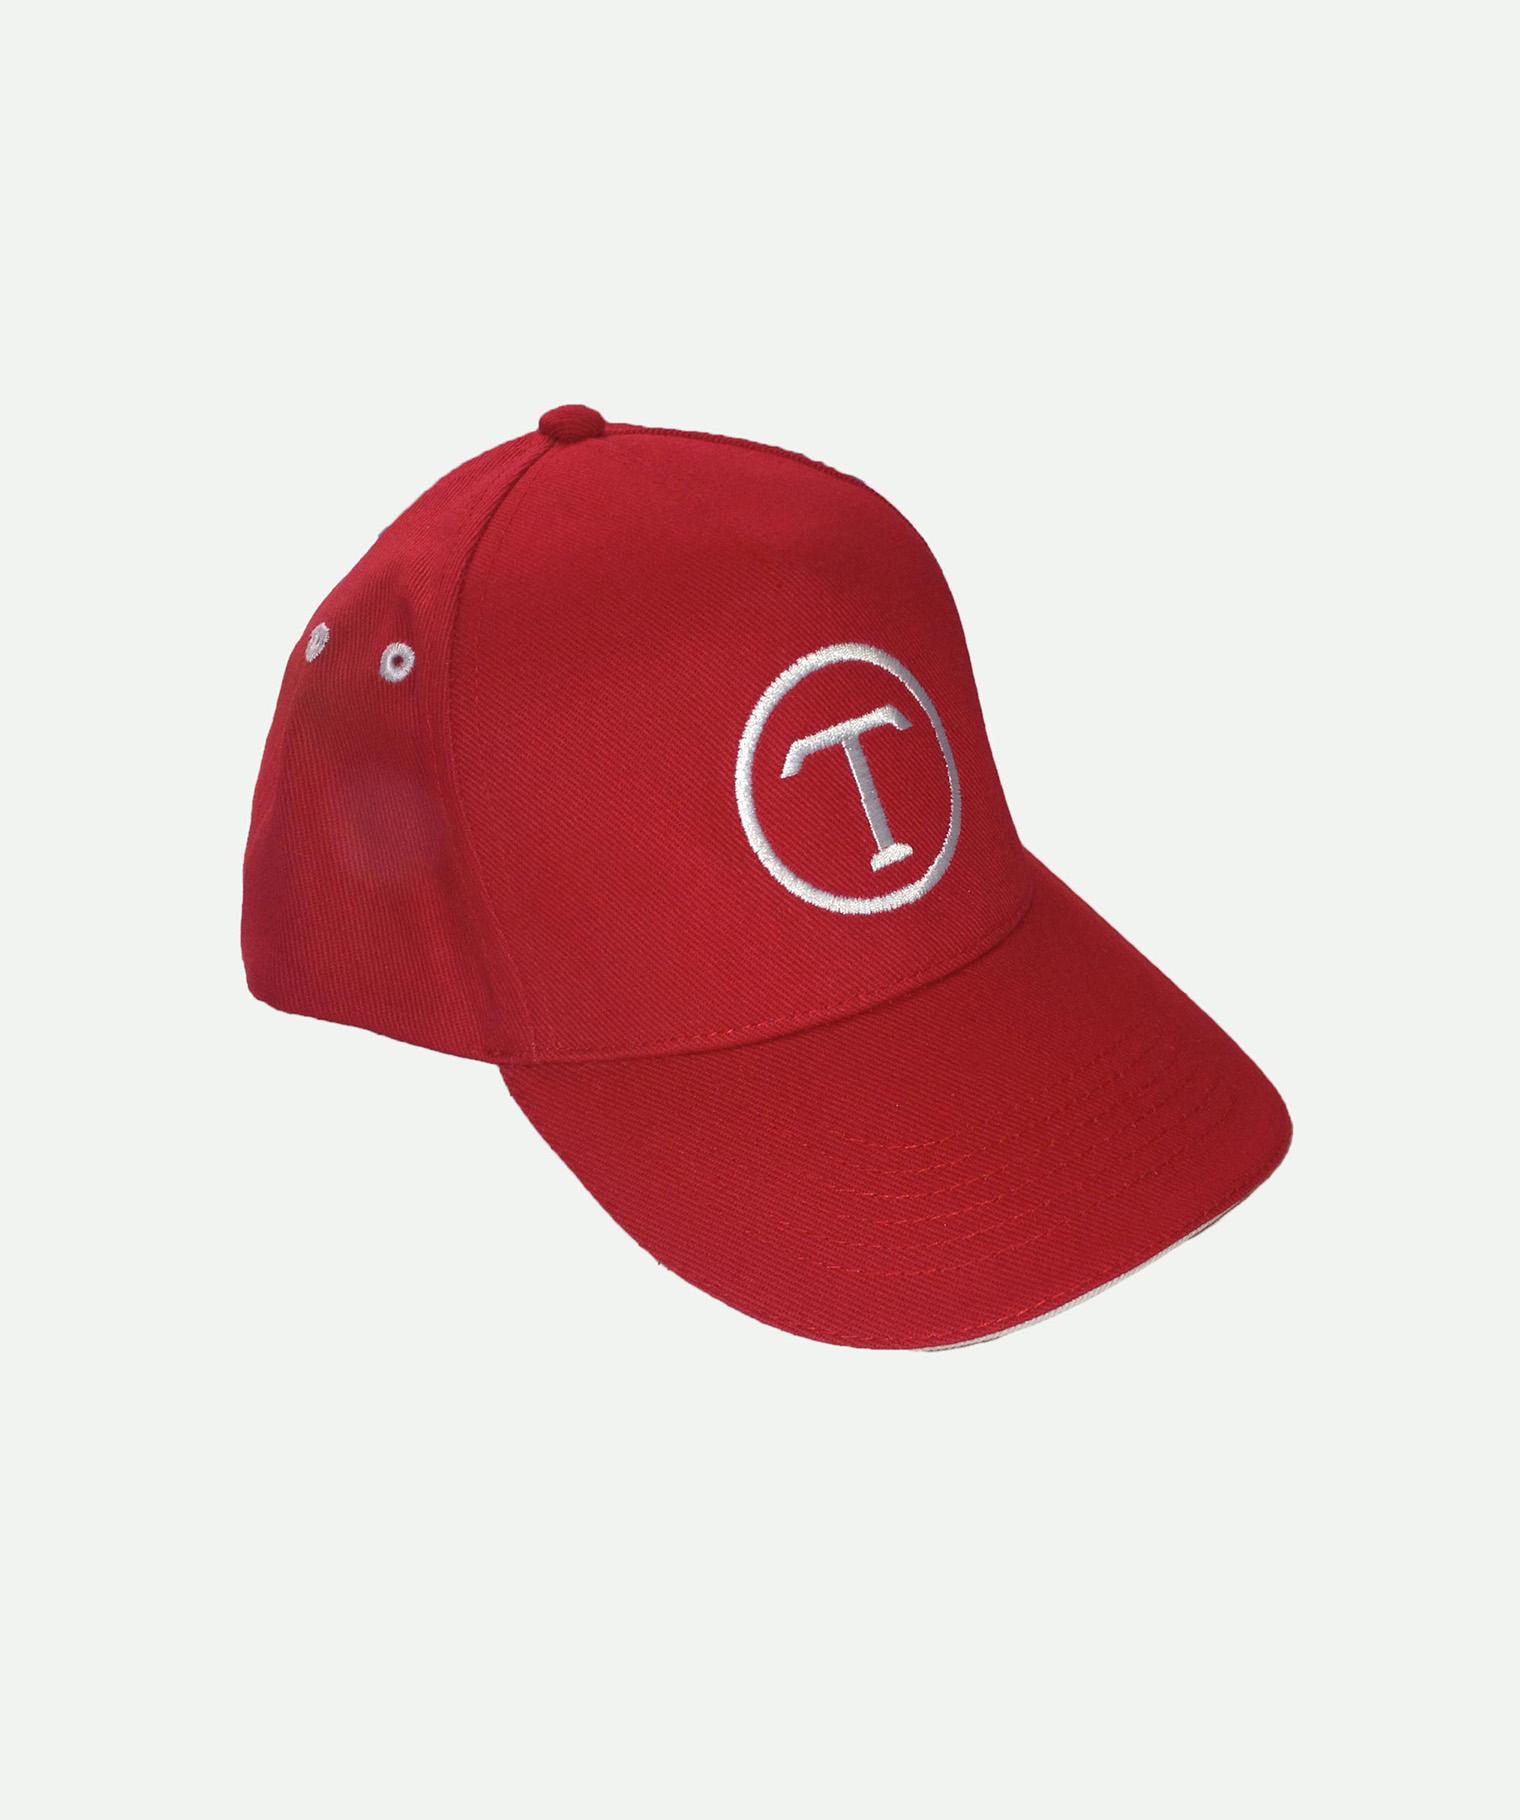 Gorra bordada 5 paneles roja